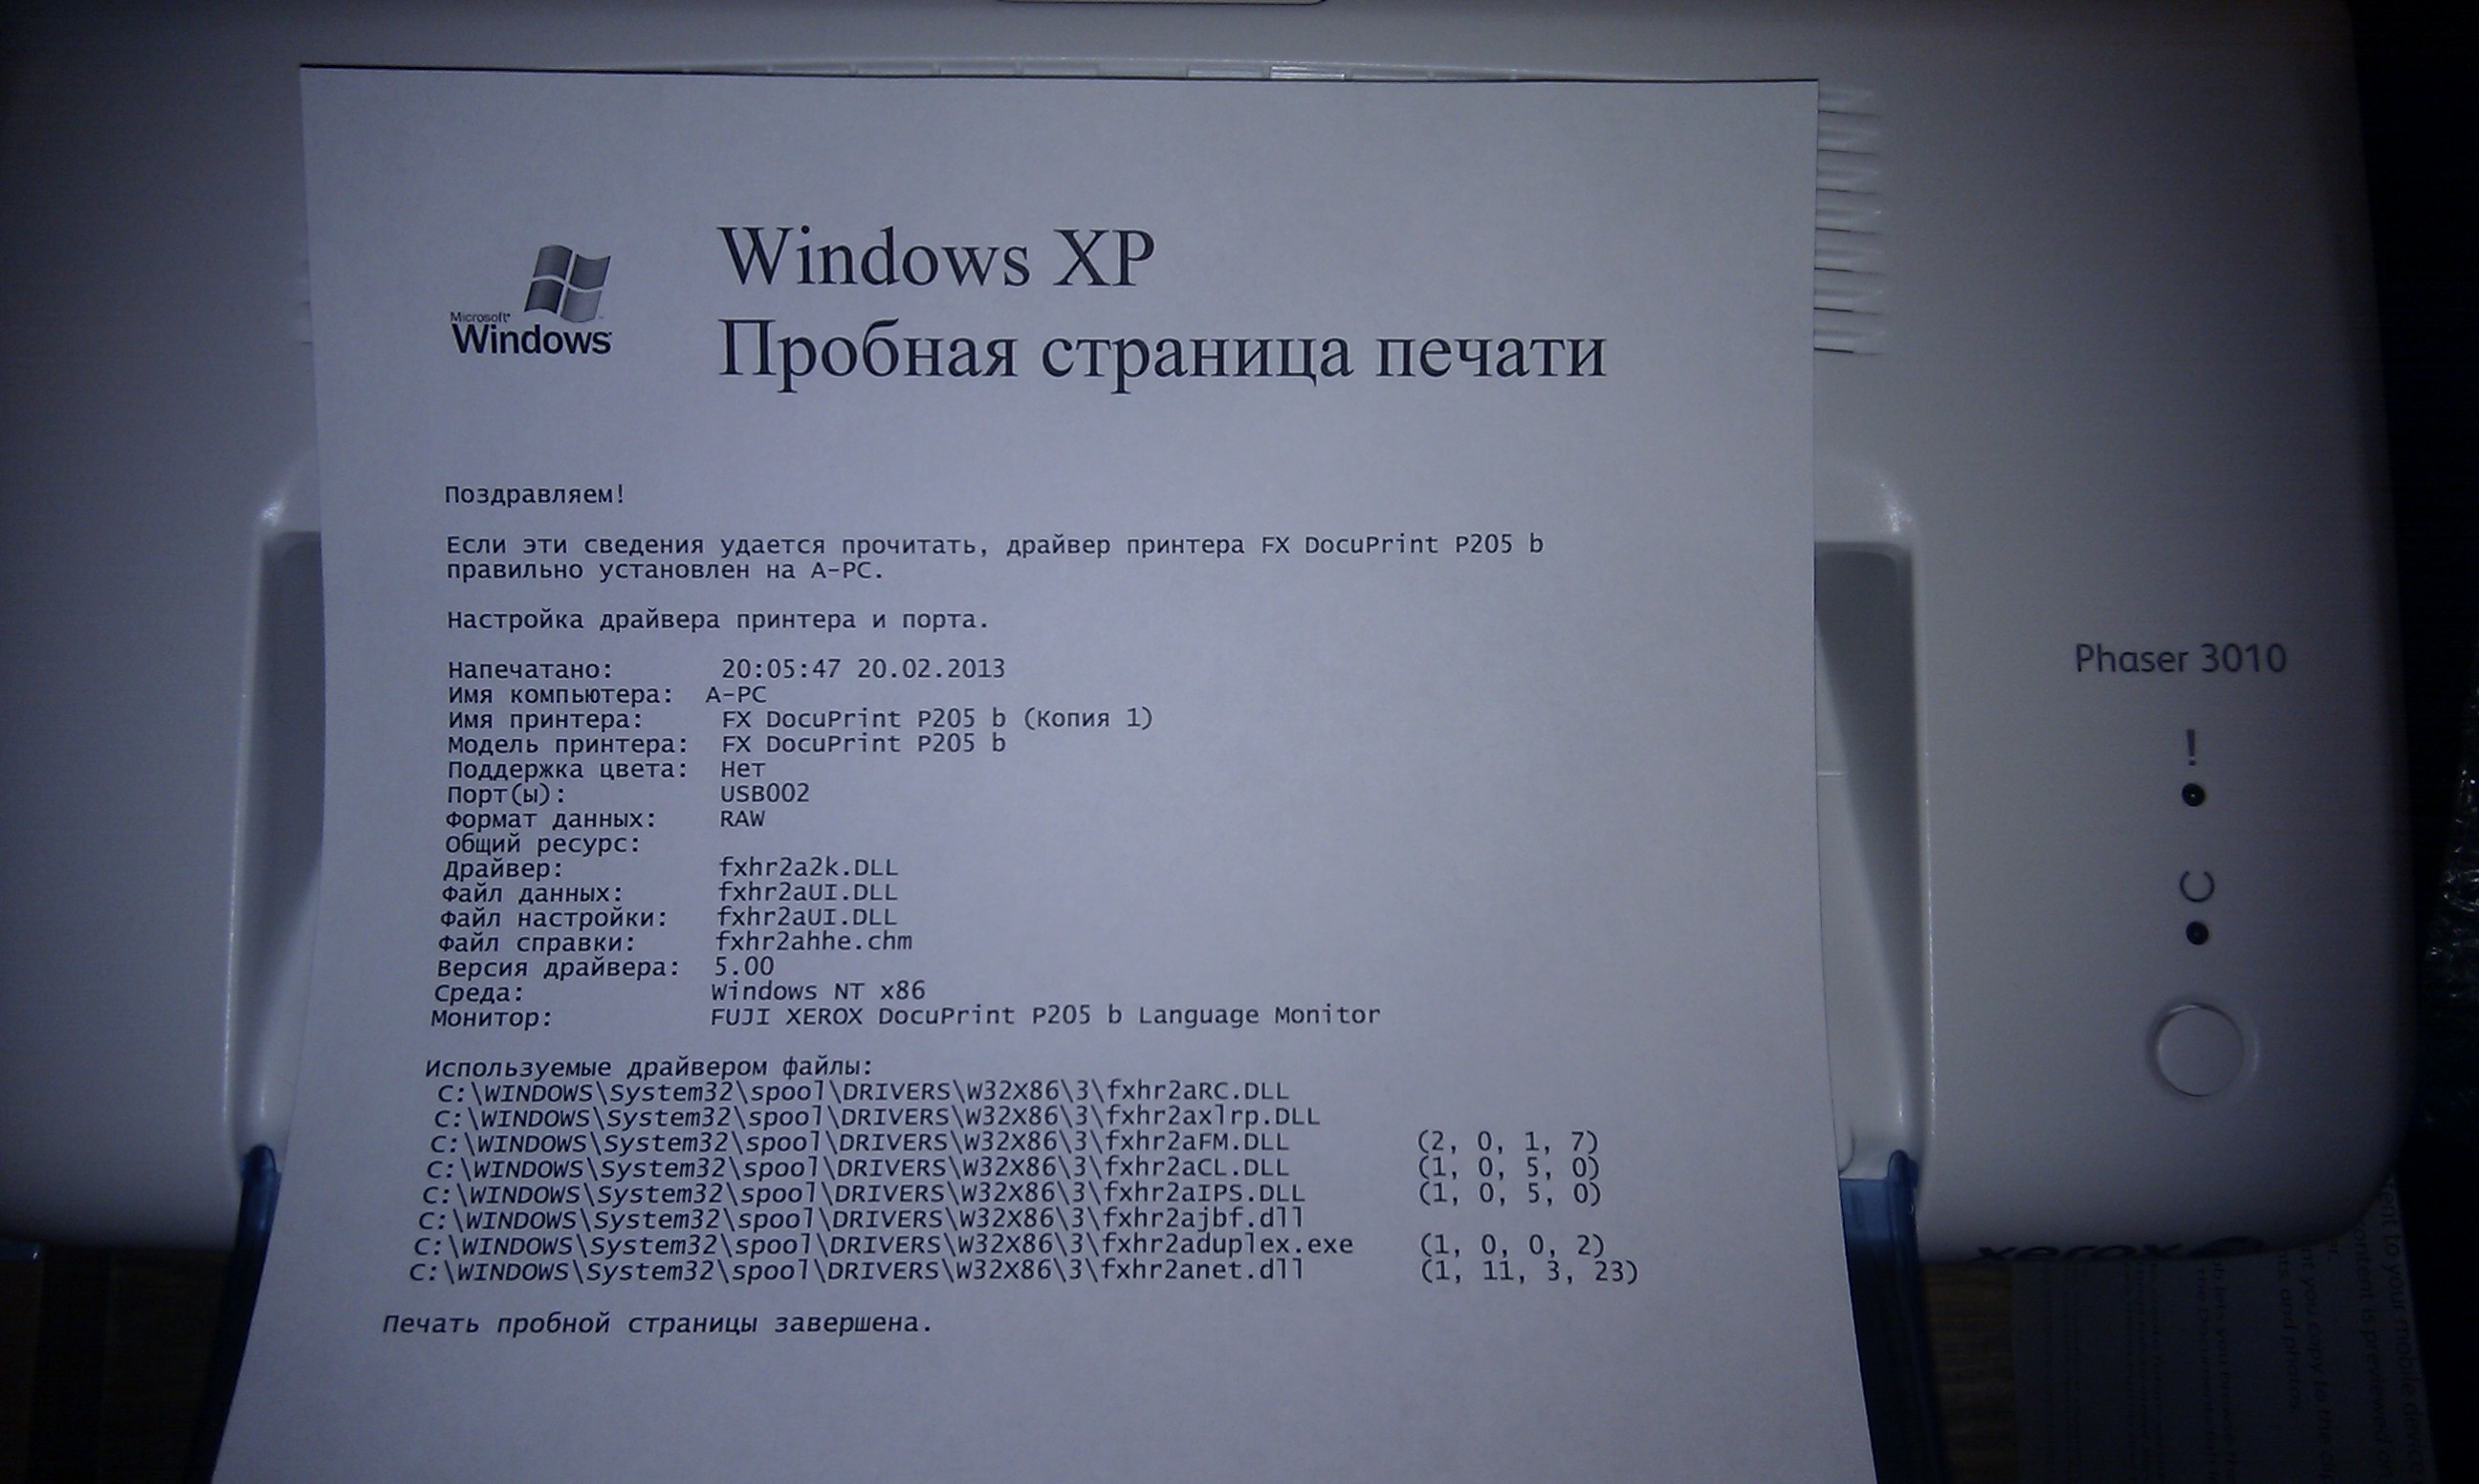 Xerox 3010 printer drivers for windows download.